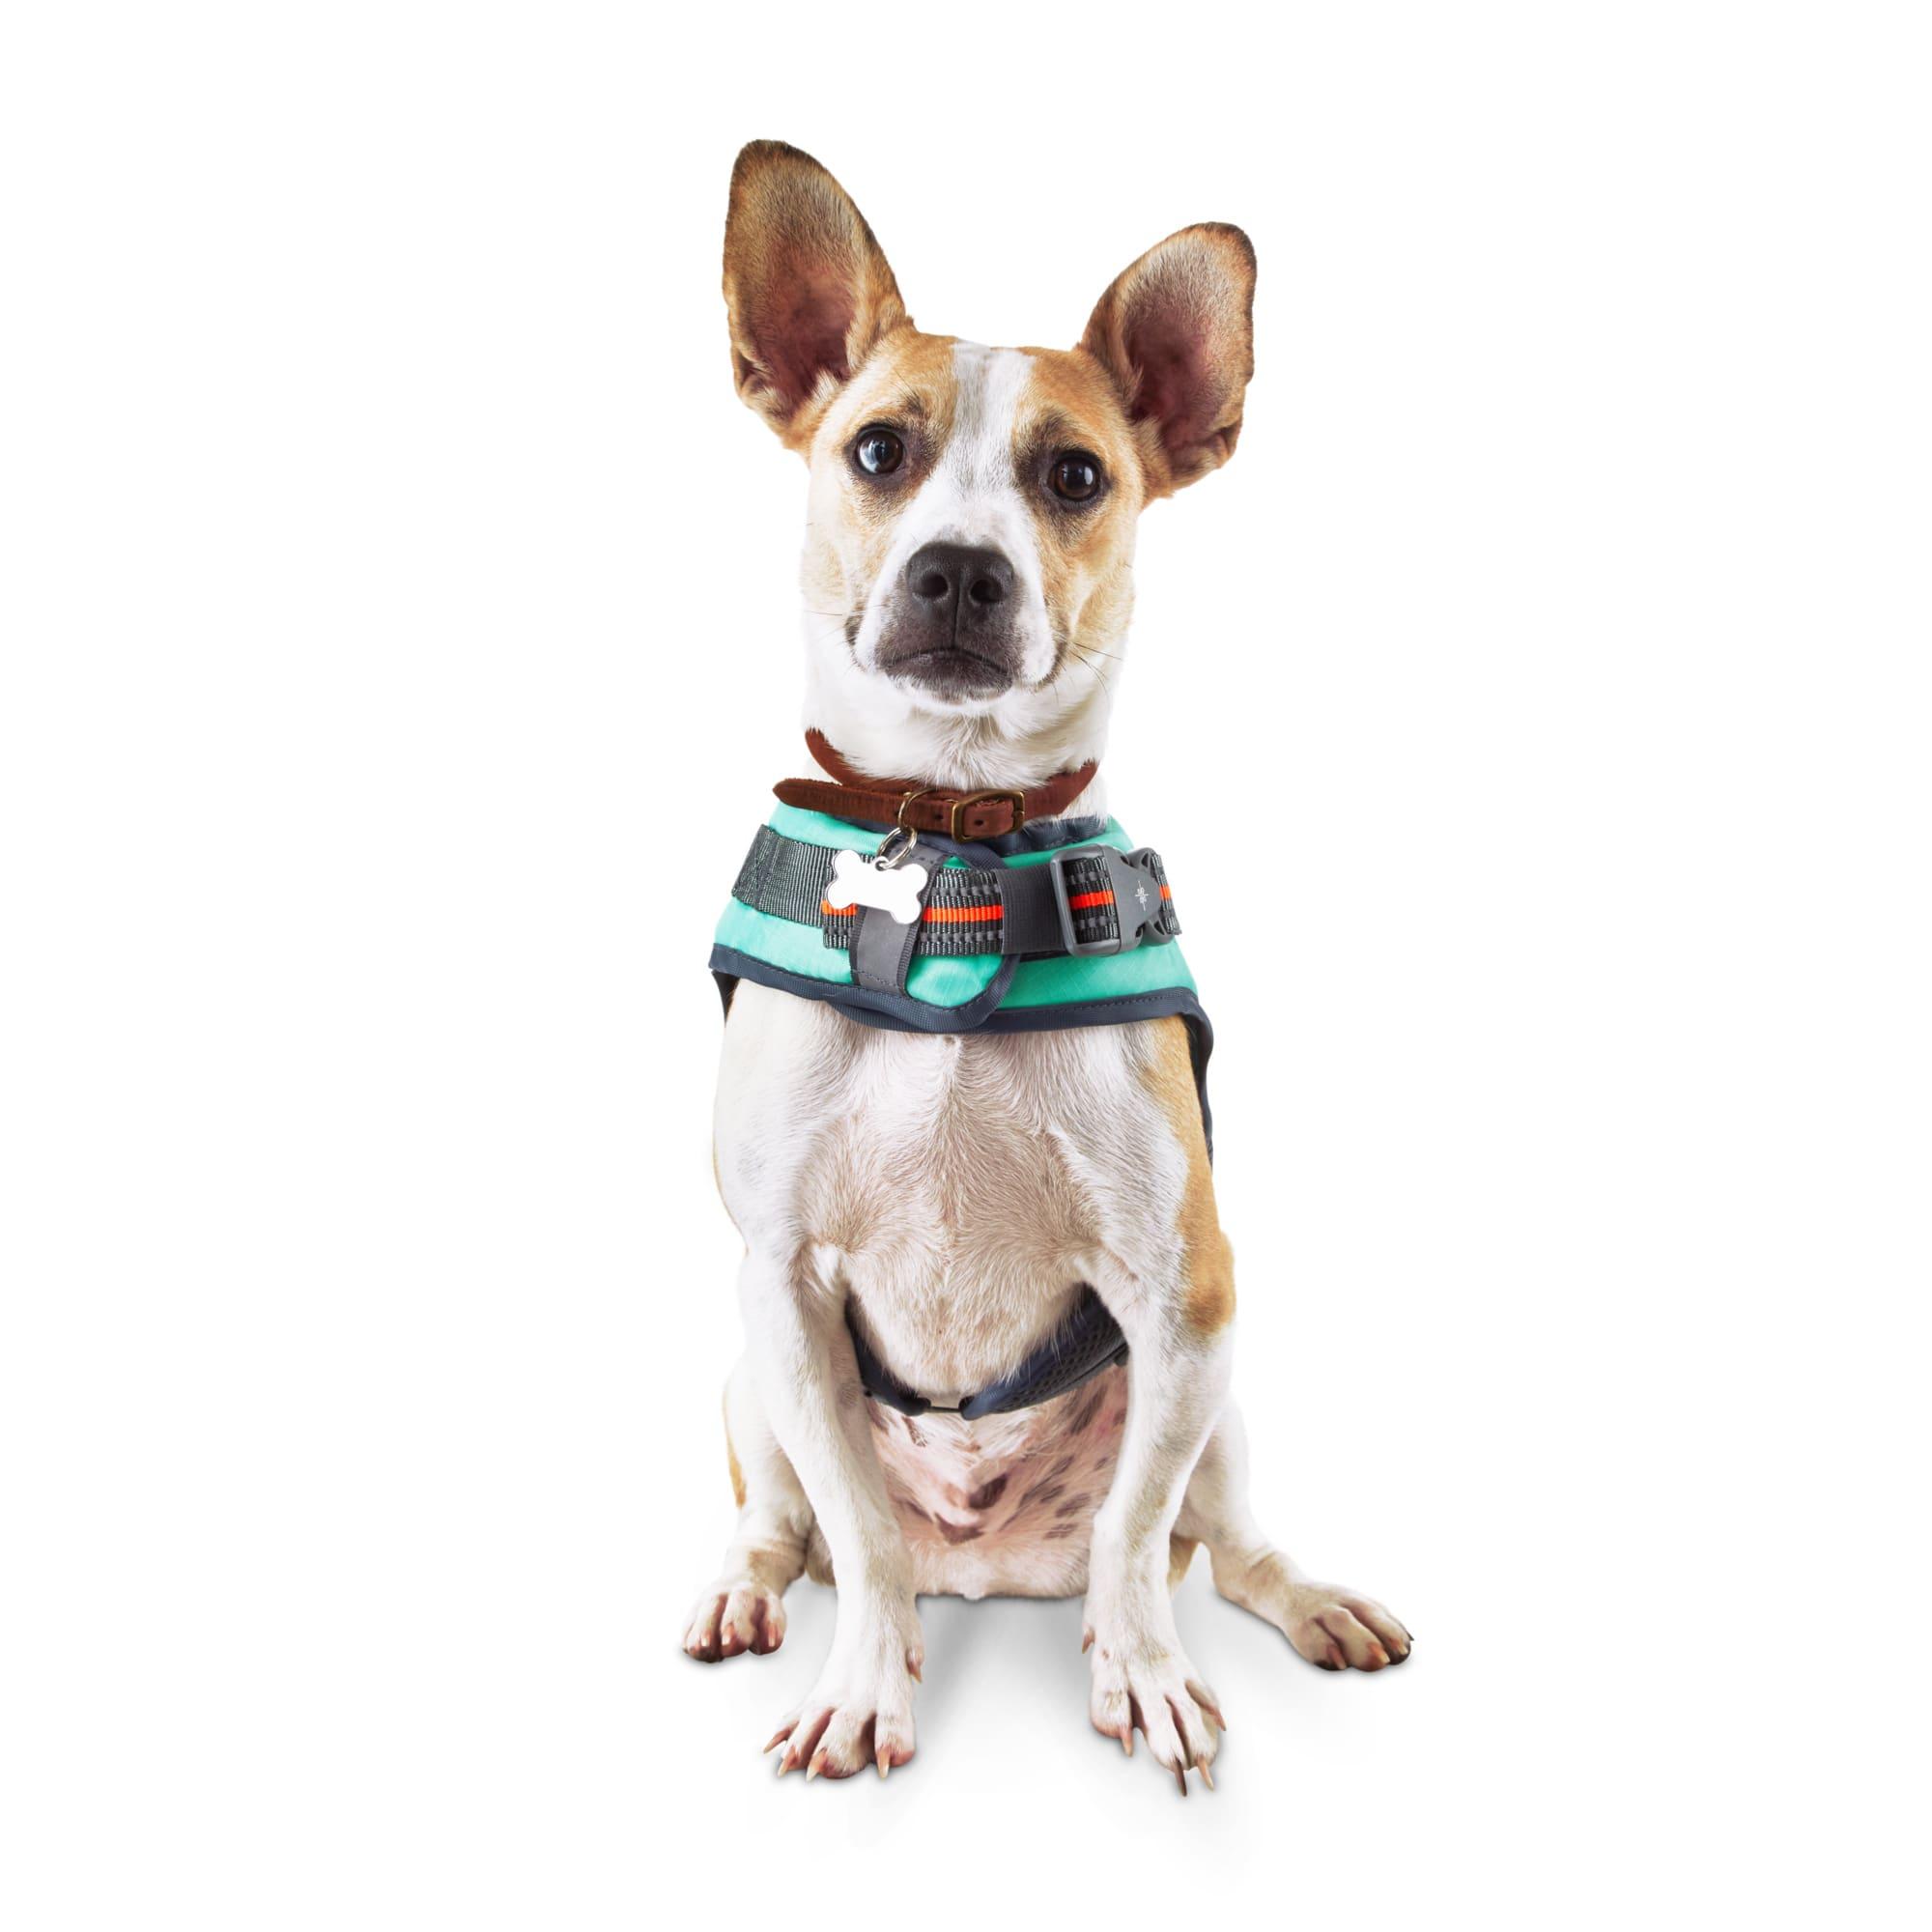 Good2go Dog Deluxe Floatation Vest X Small Petco